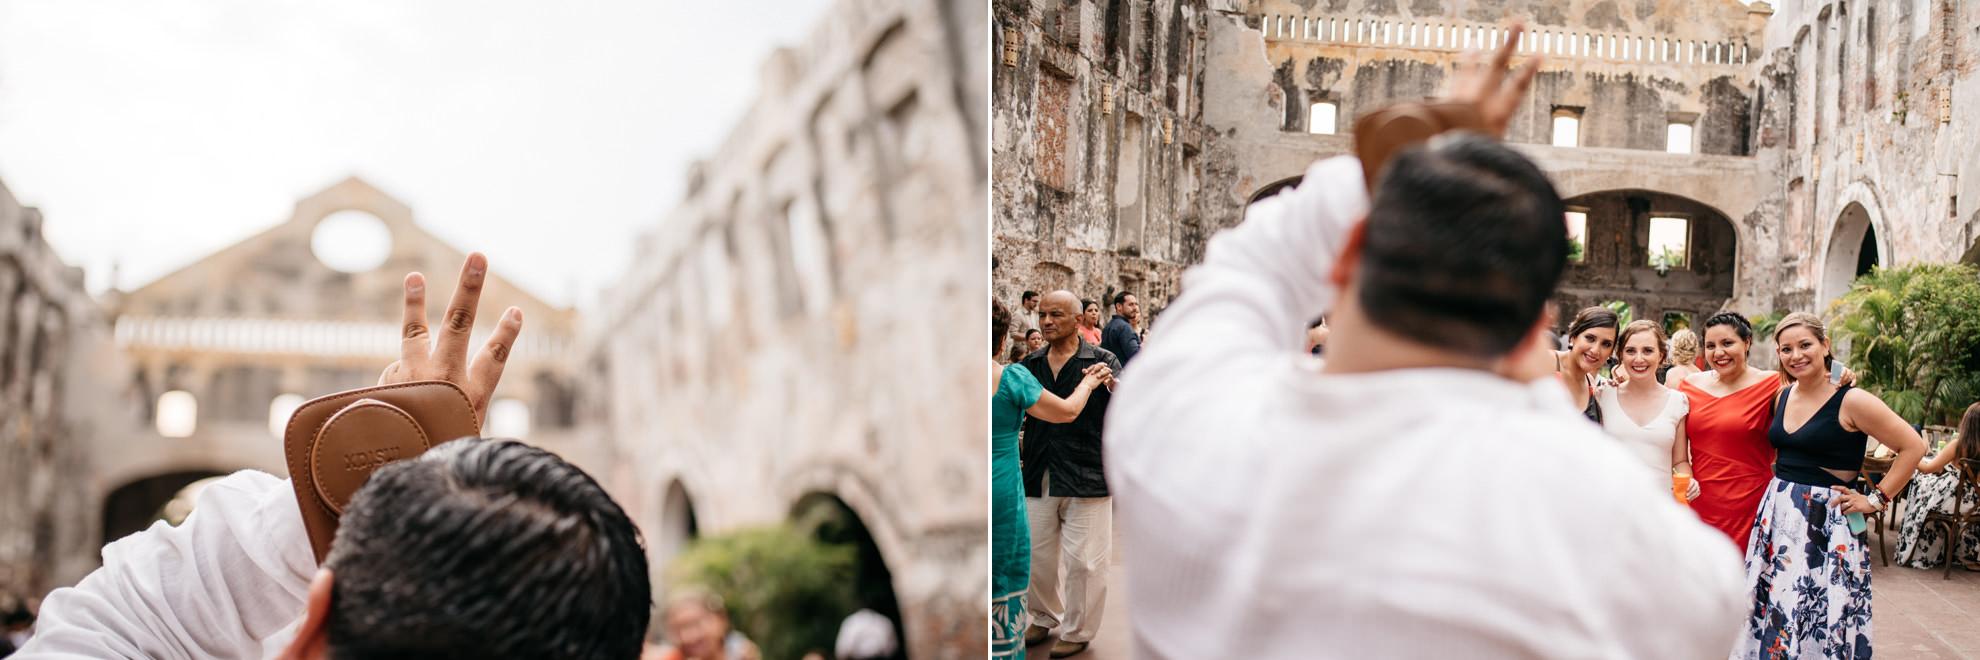 076 - wedding hacienda san carlos.jpg